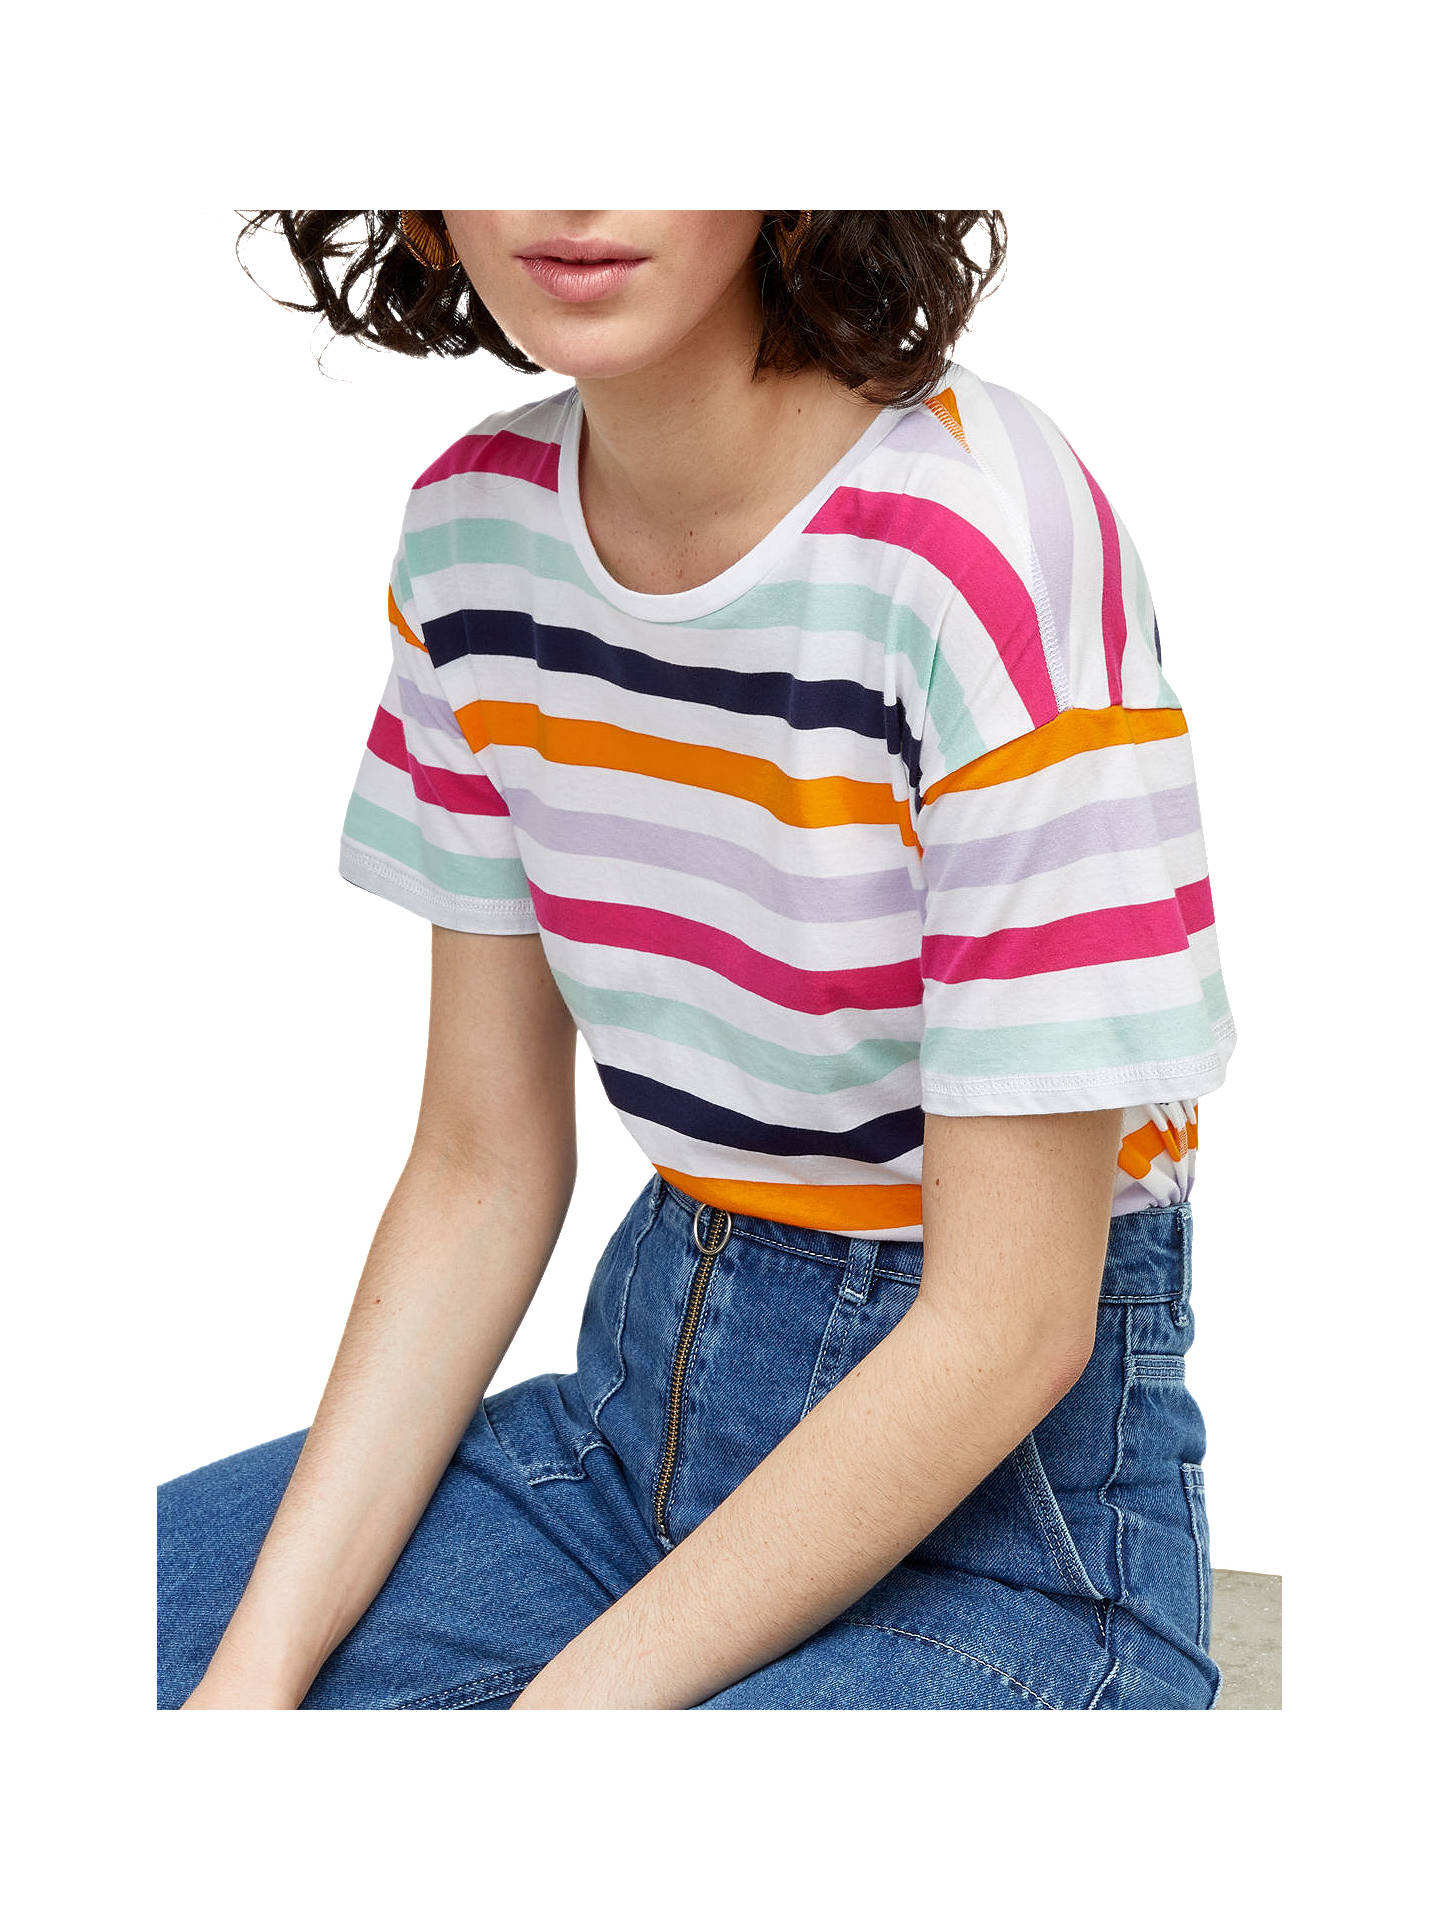 352f9c3830 Buy Warehouse Rainbow Stripe Casual T-Shirt